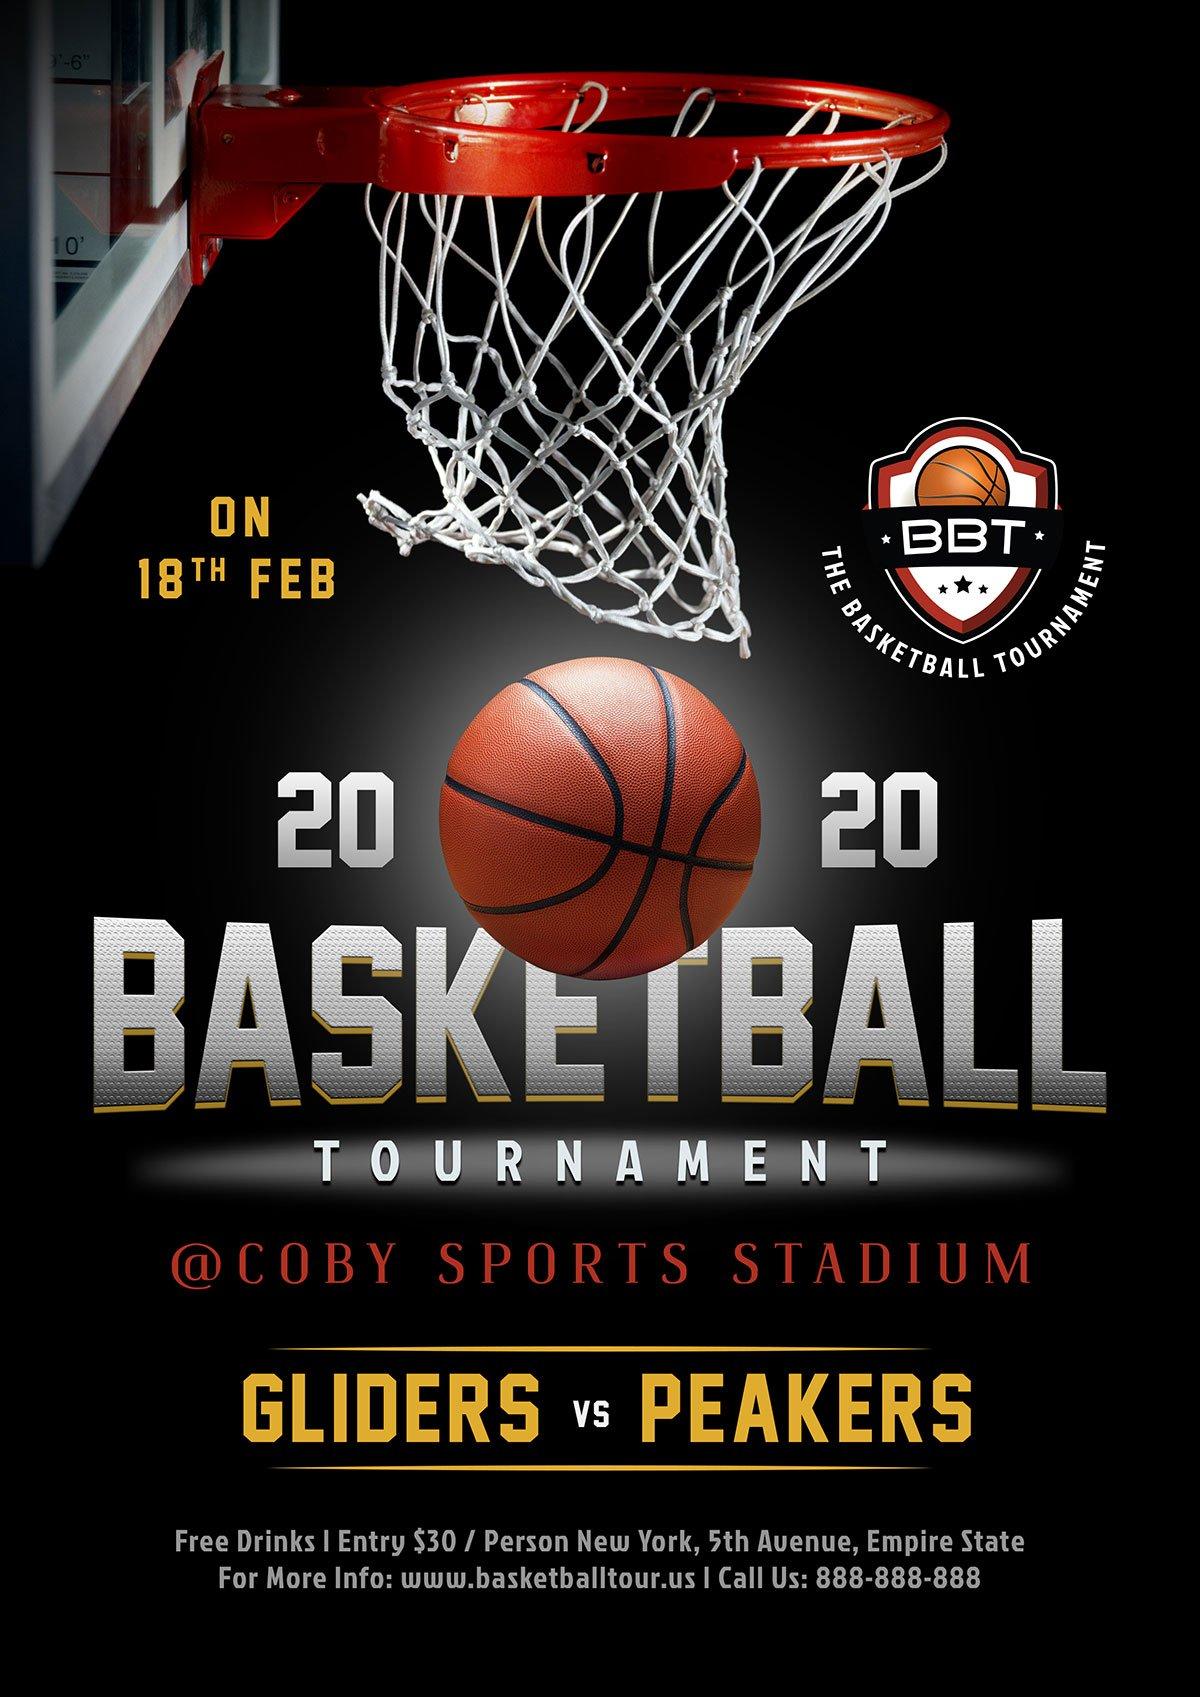 Free Basketball Tournament Playoff Game Flyer Design